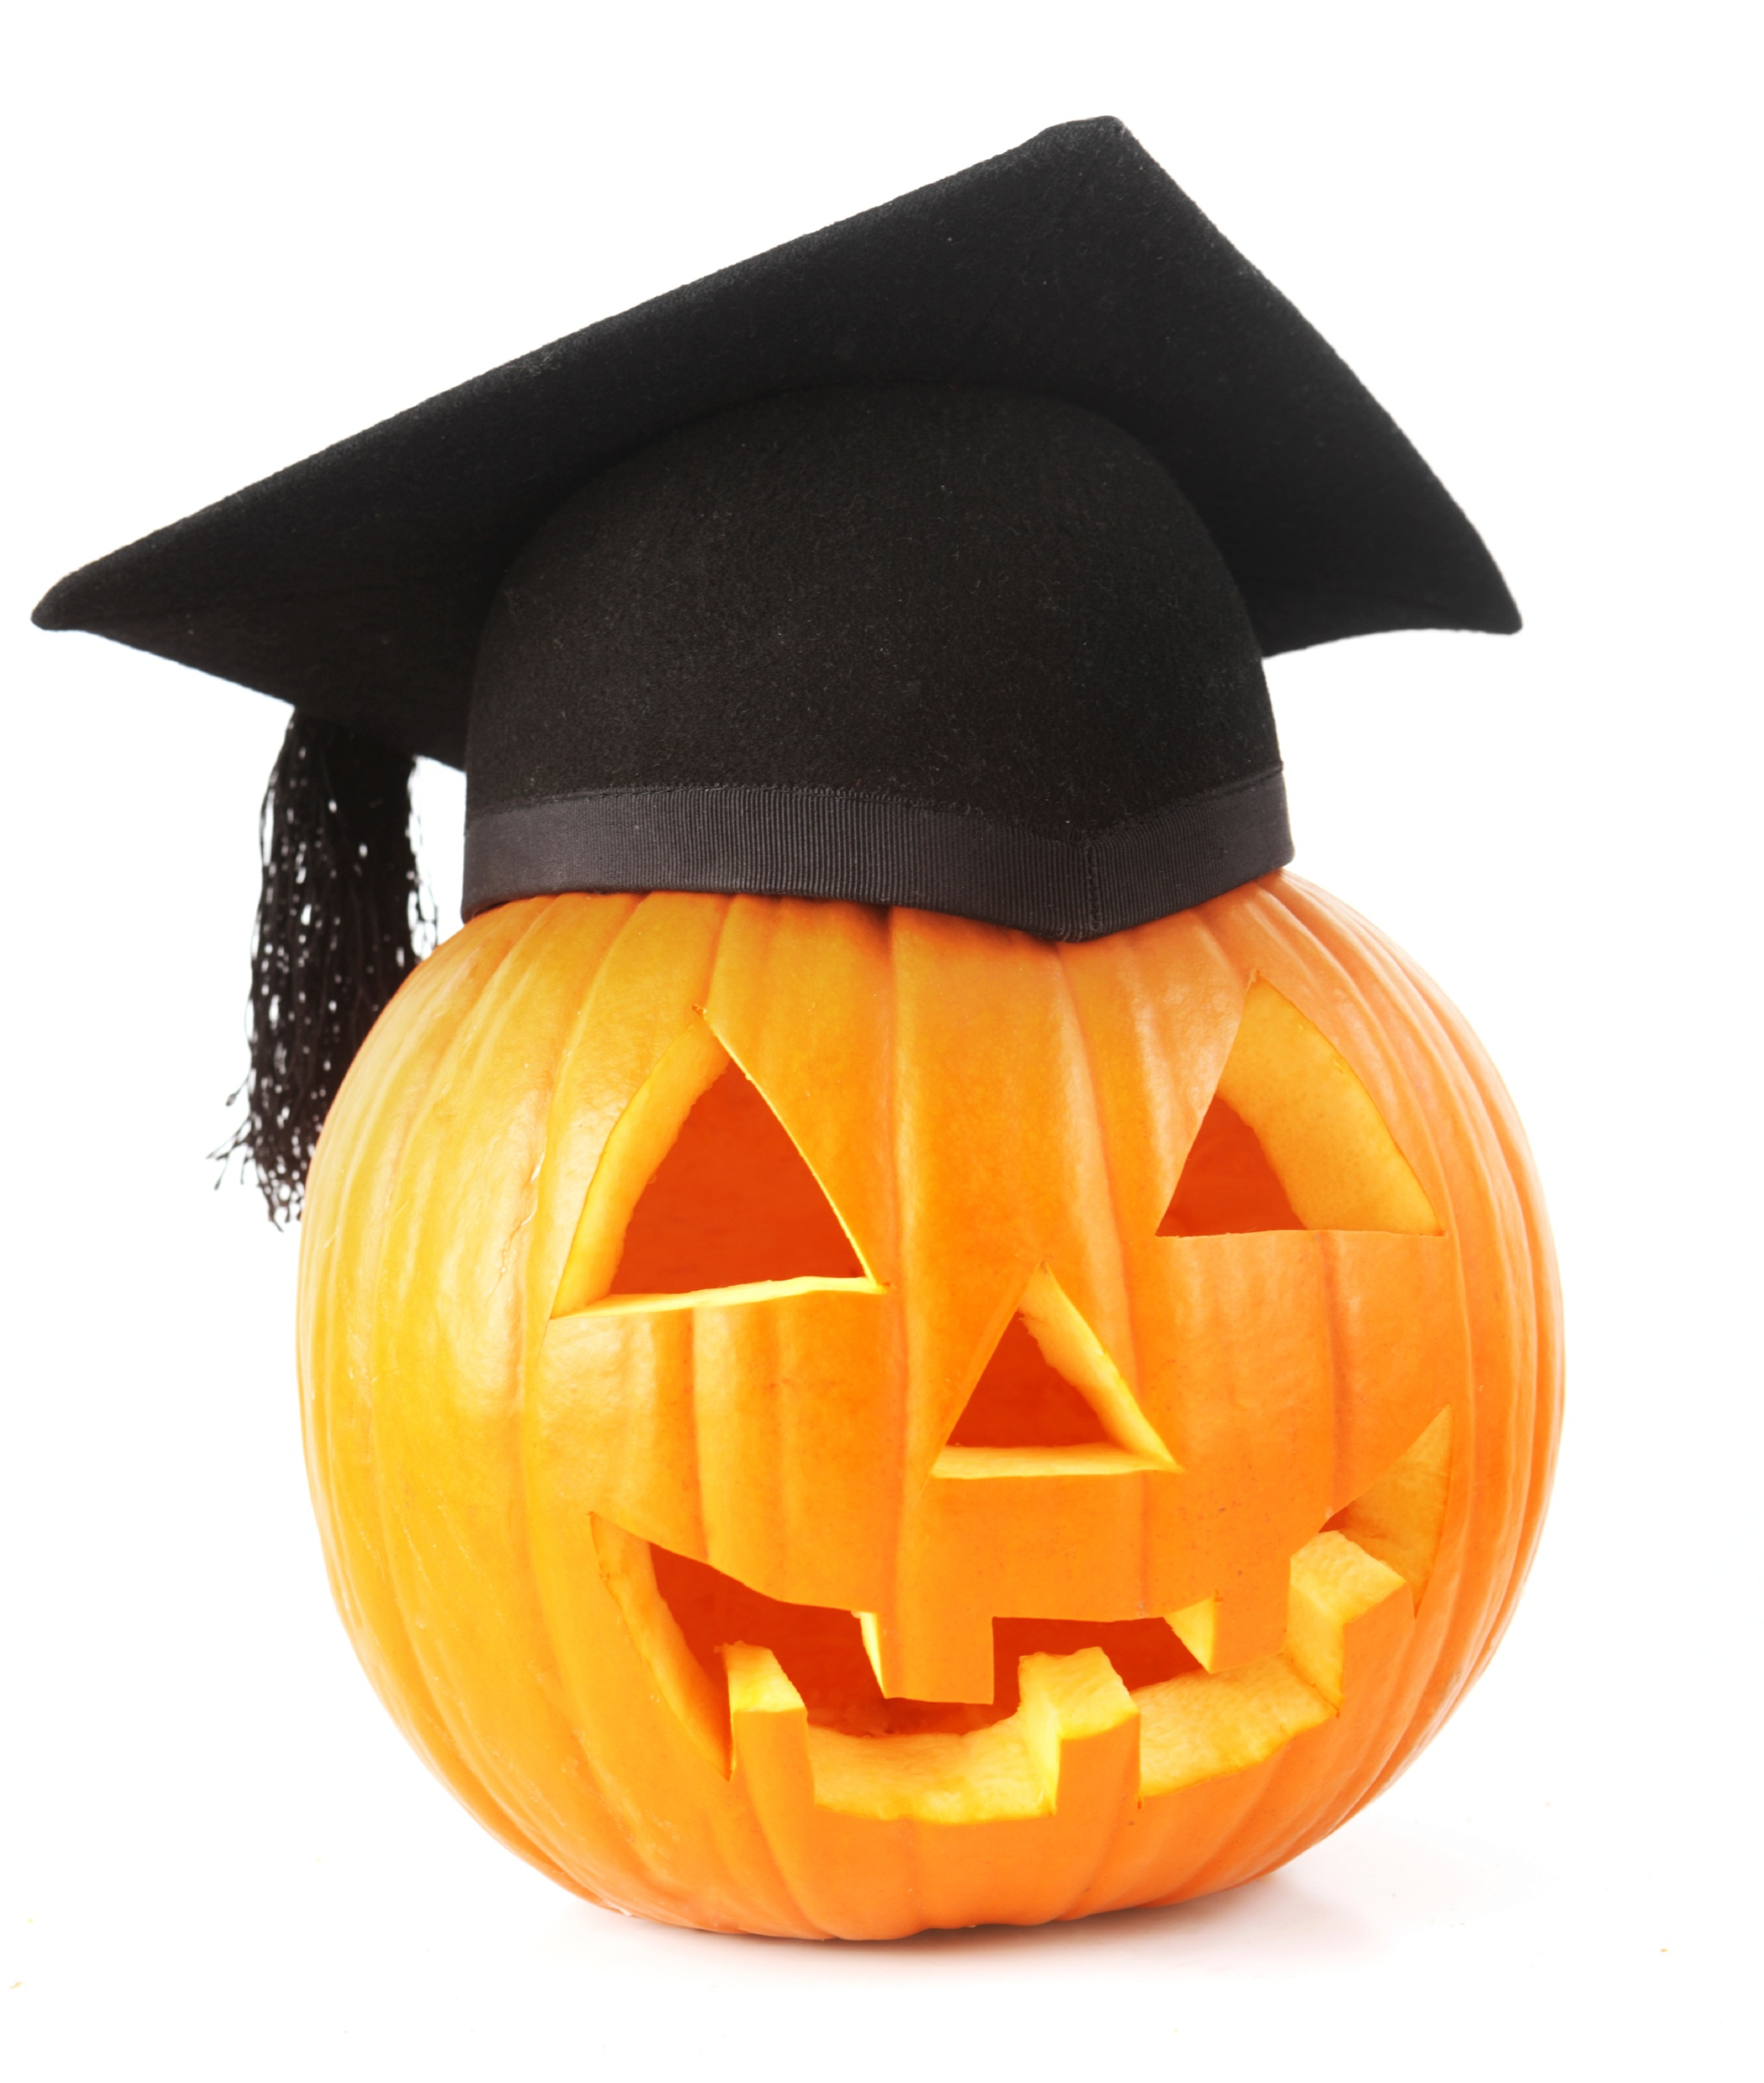 Jack o lantern wearing a graduation cap